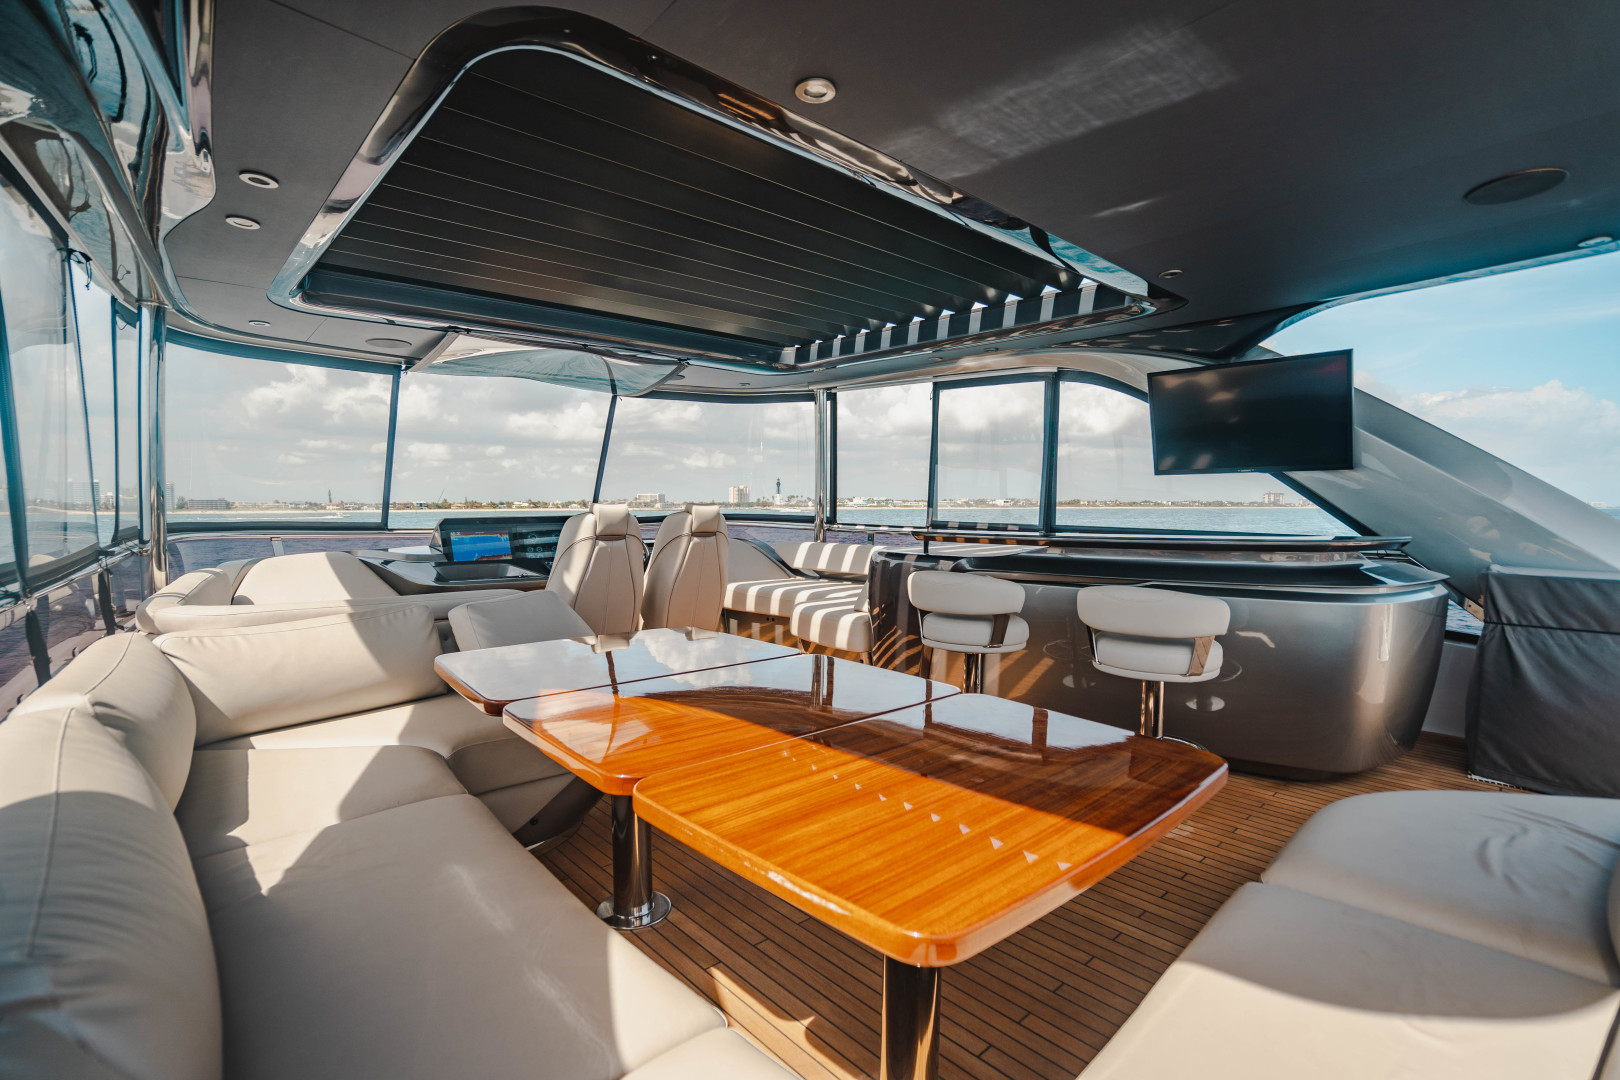 Princess-Y85  2019-Splash Delray Beach-Florida-United States-1631630 | Thumbnail